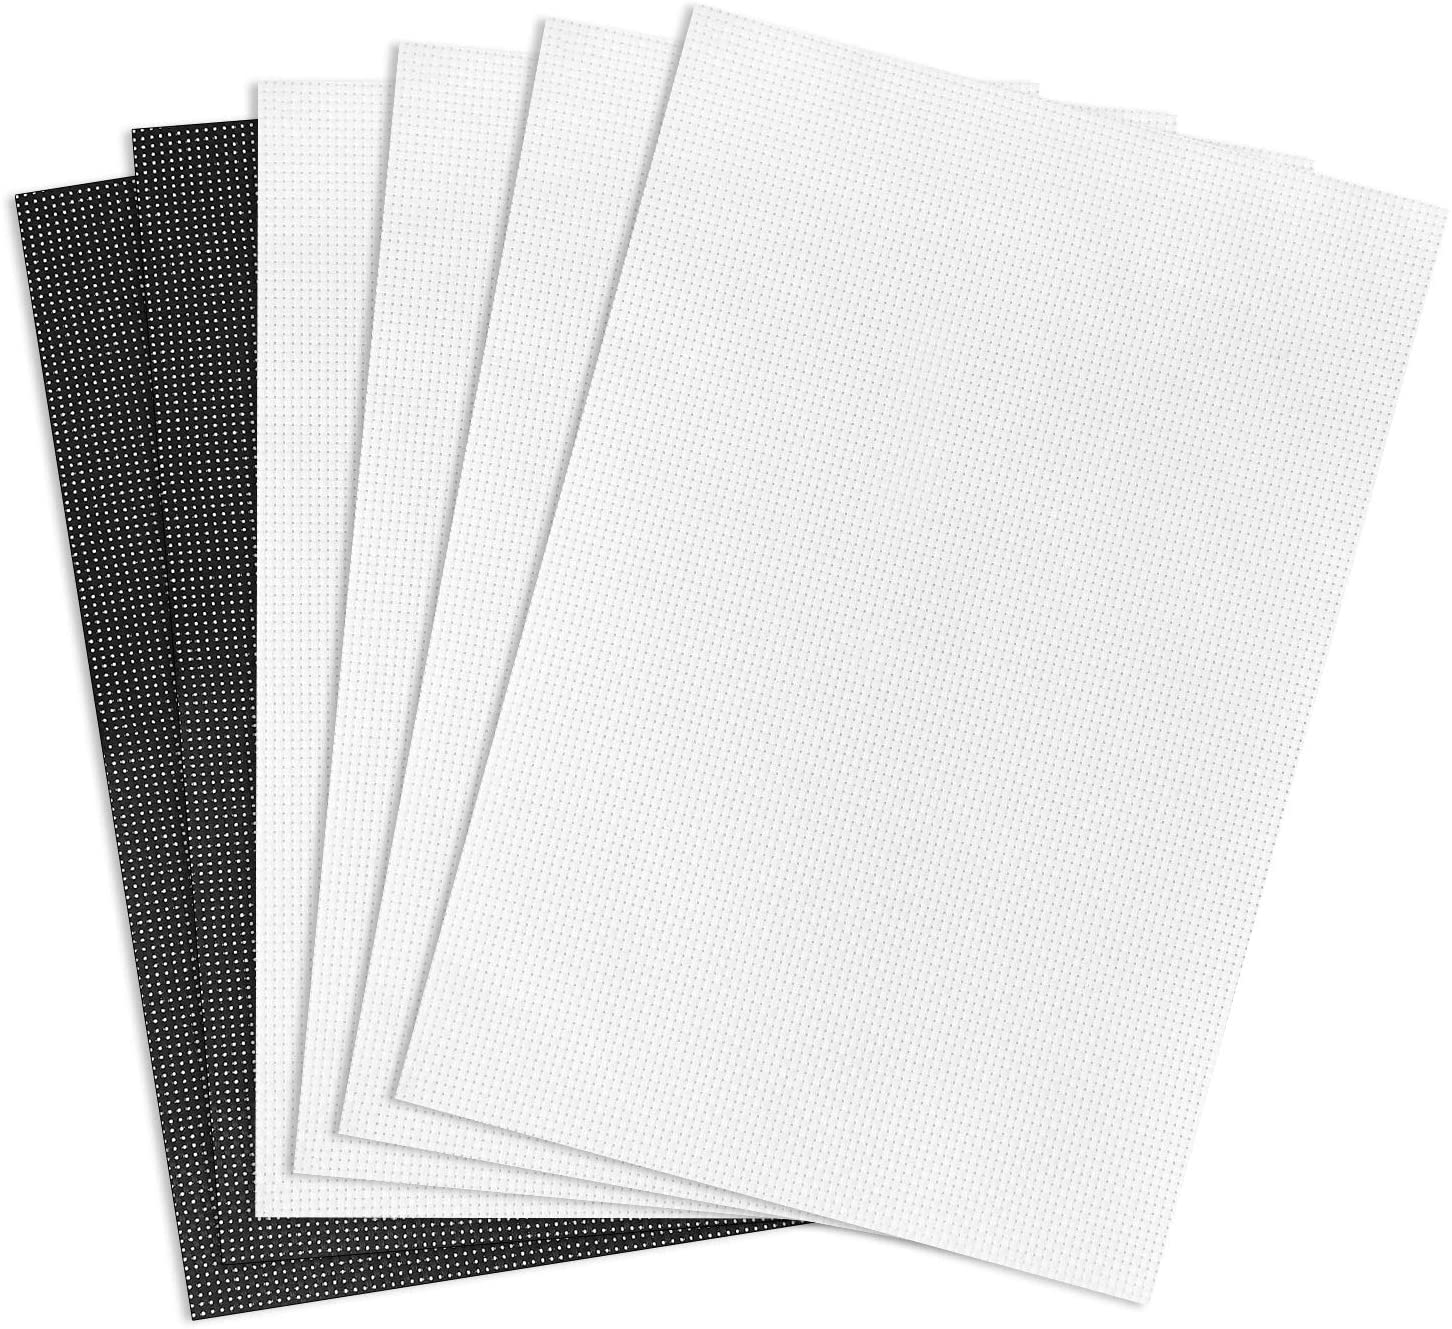 Maydear Cross Stitch Cloth 11 Count Cotton Aida Fabric Needlework DIY 6 Pieces 12×18(inch)-White(4pcs),Black(2pcs)